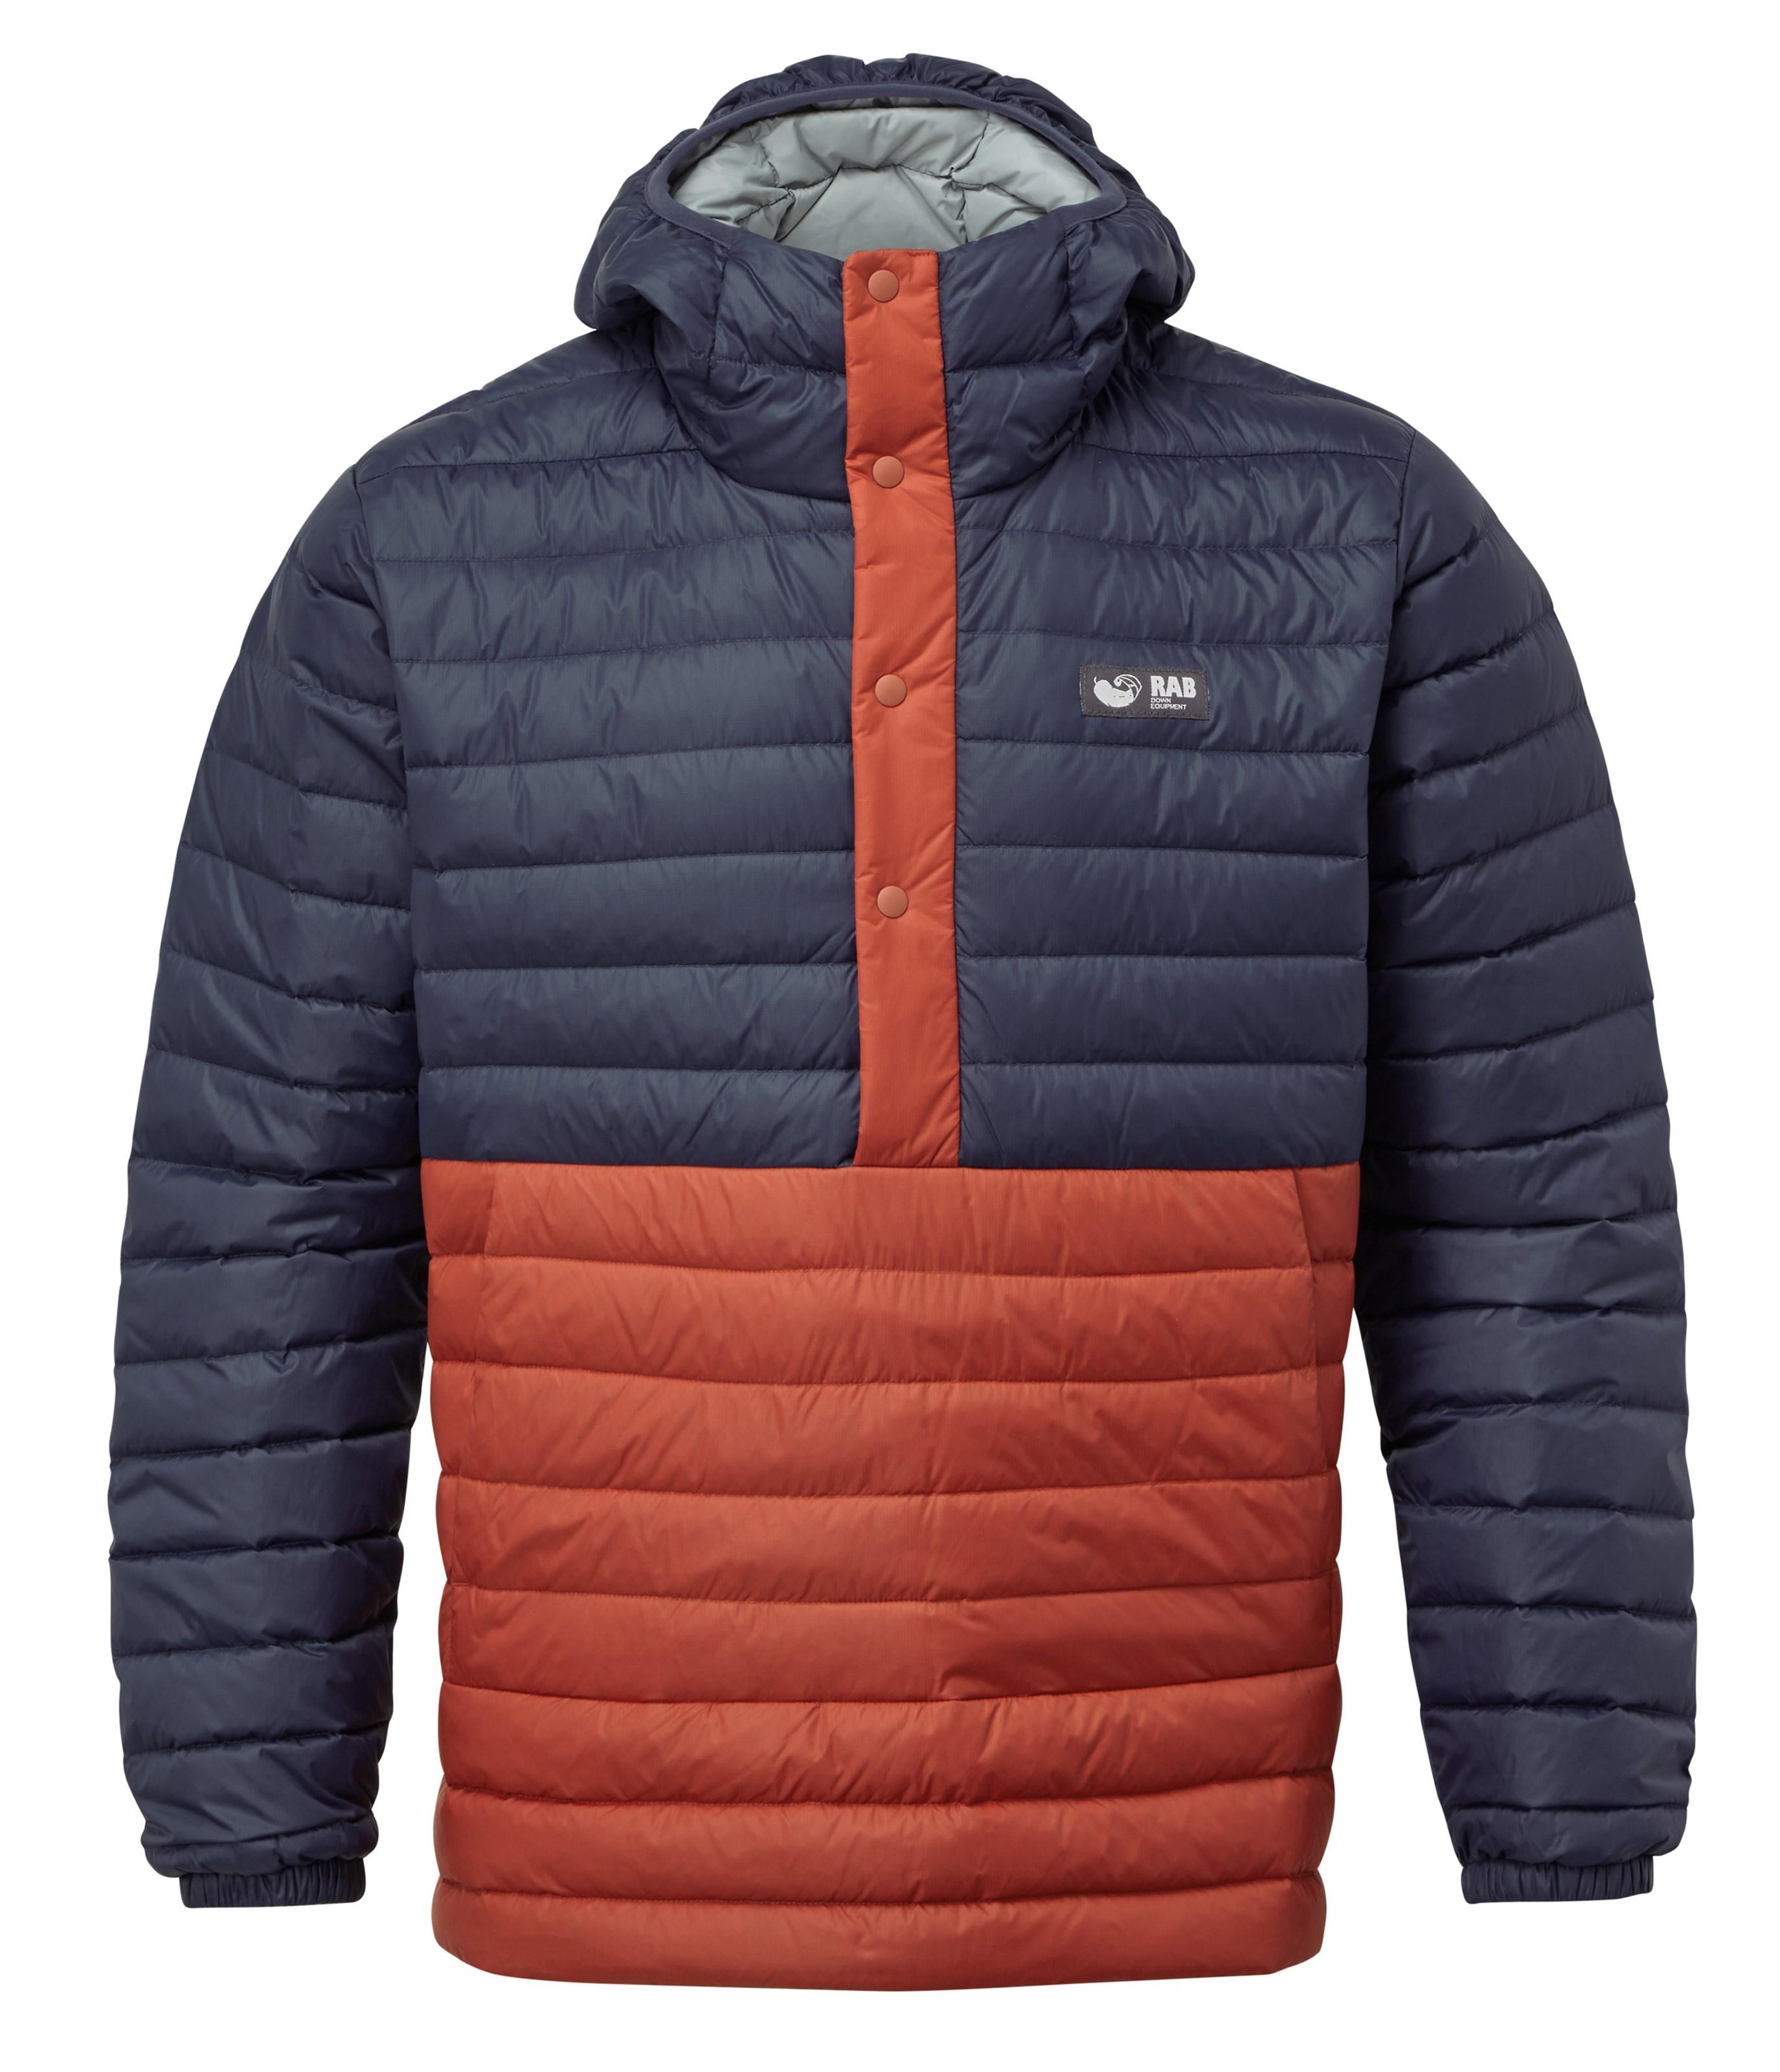 Patagonia snap T pullover Down. Anorakk dunjakke   FINN.no